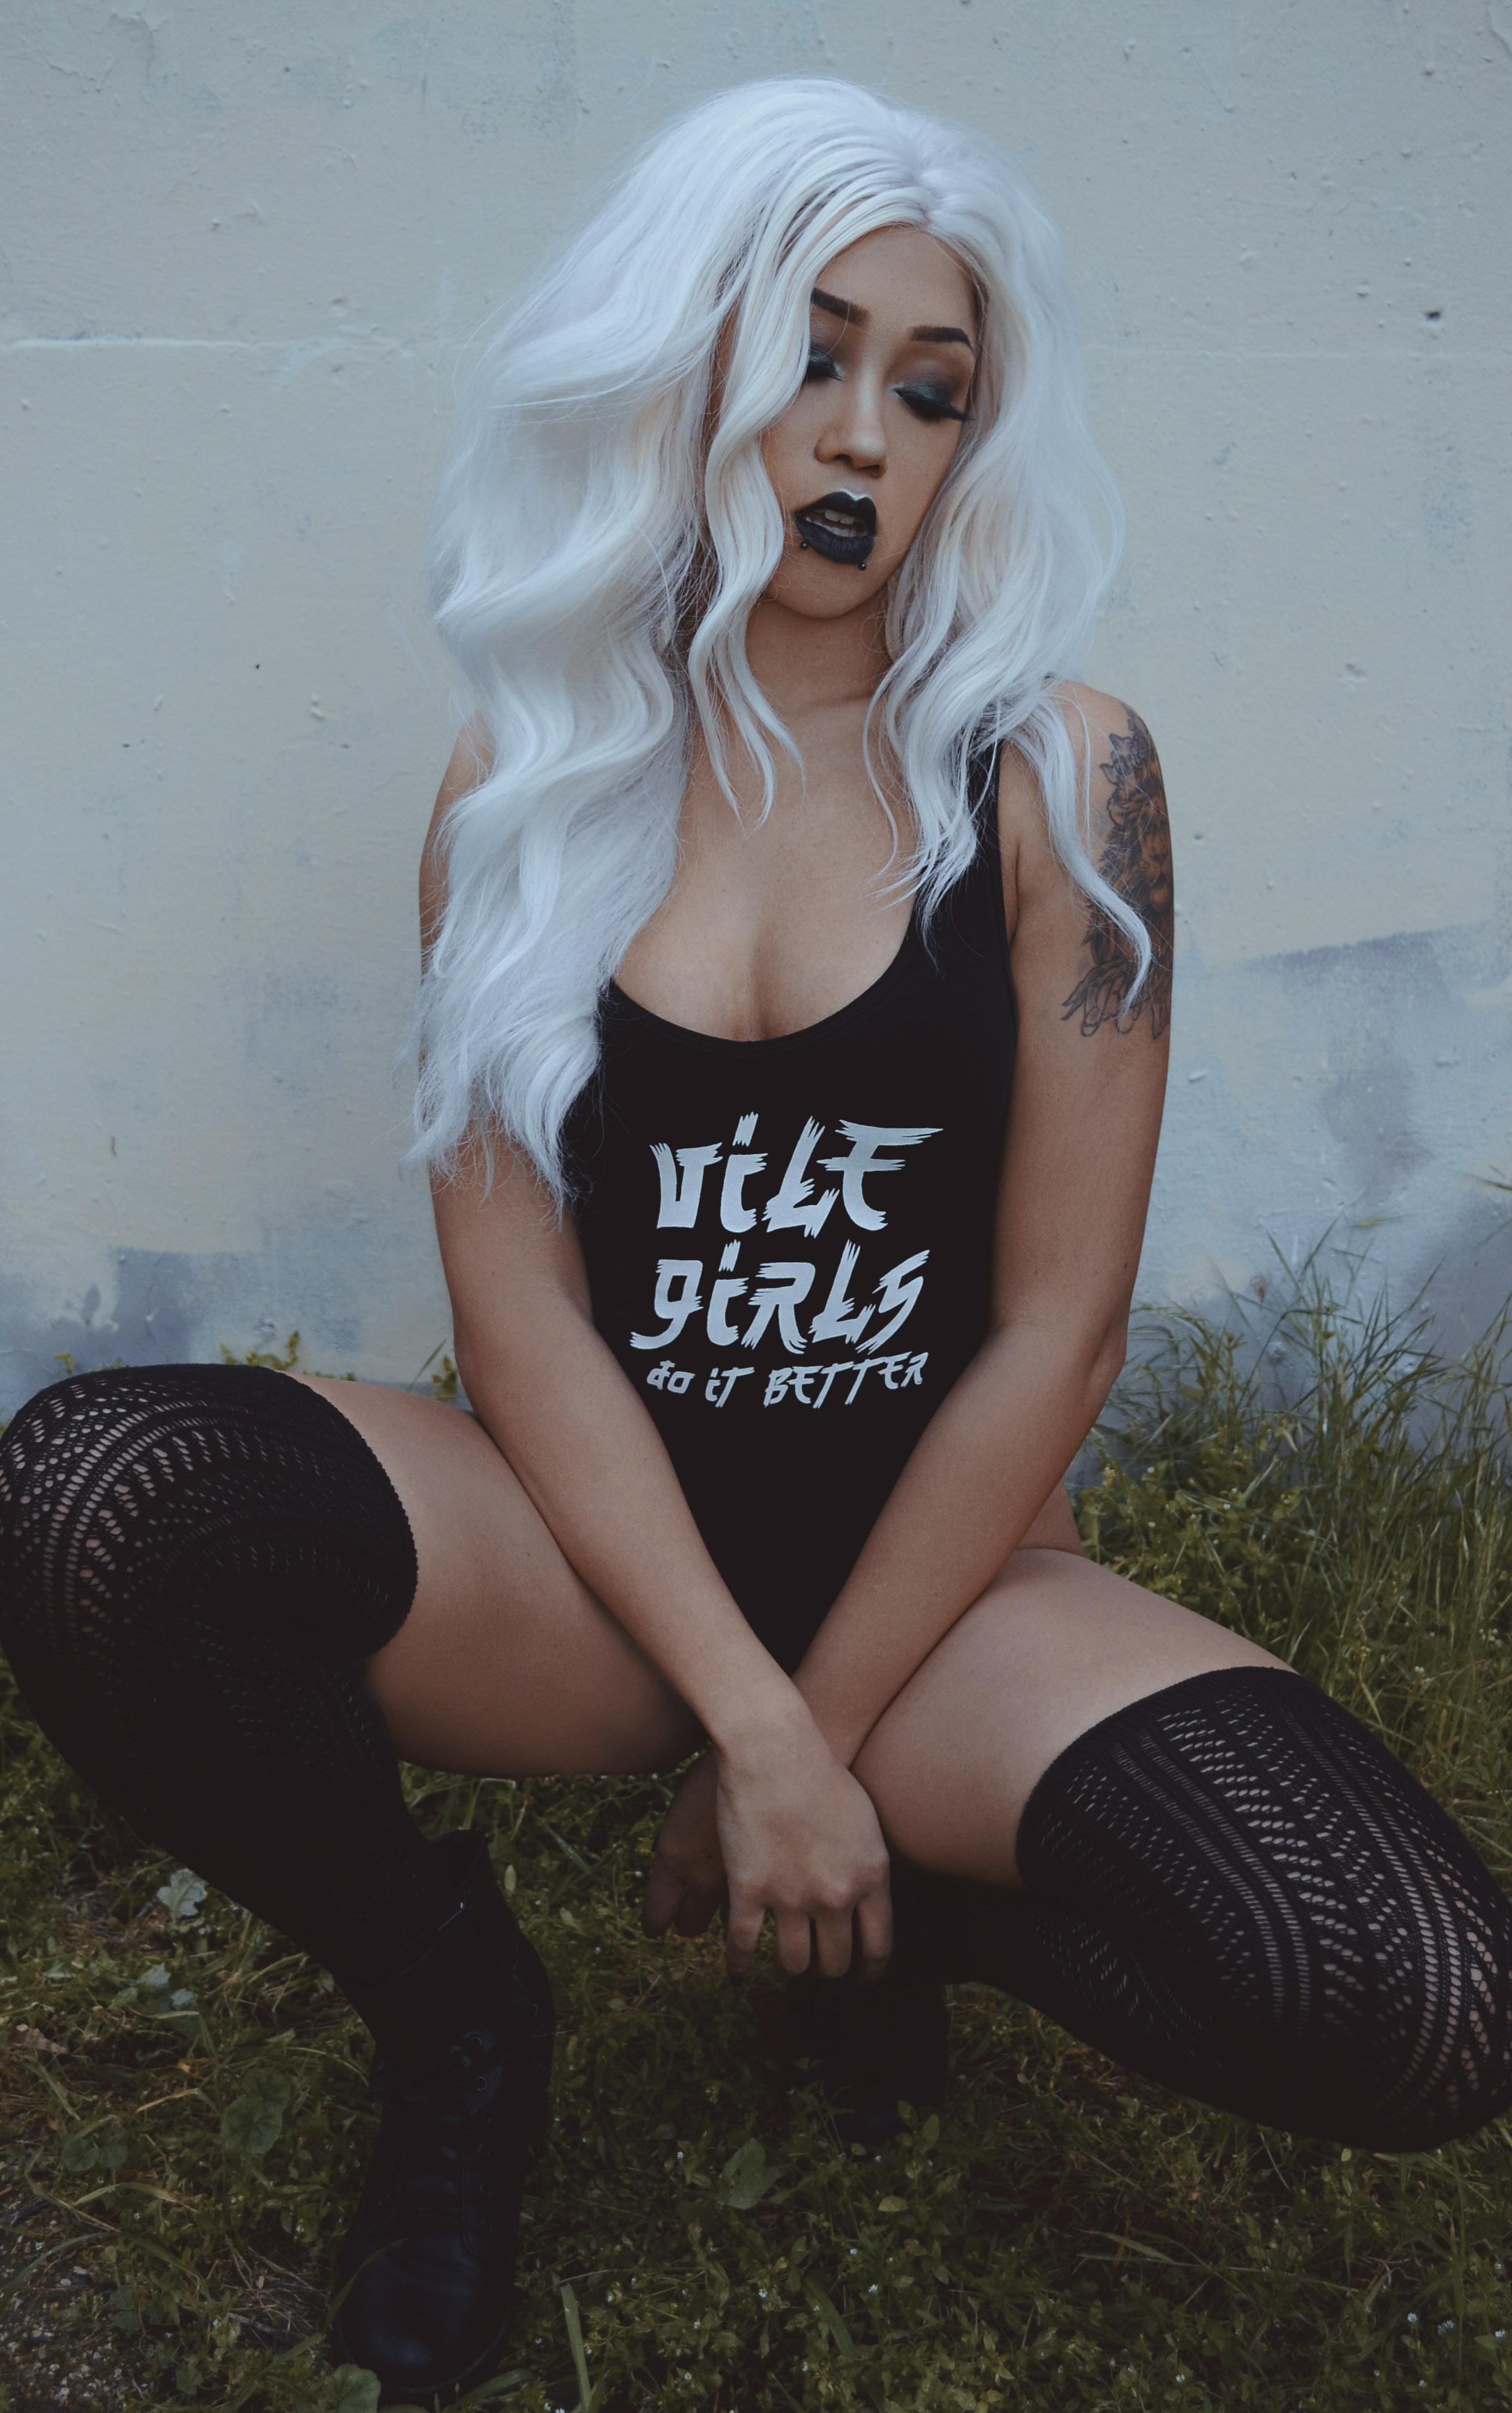 toxic_love_photography_jack_taja_edit11_vile_vileco_vilegirls_girlsofvilecompany_vilecompany_detroit.jpg